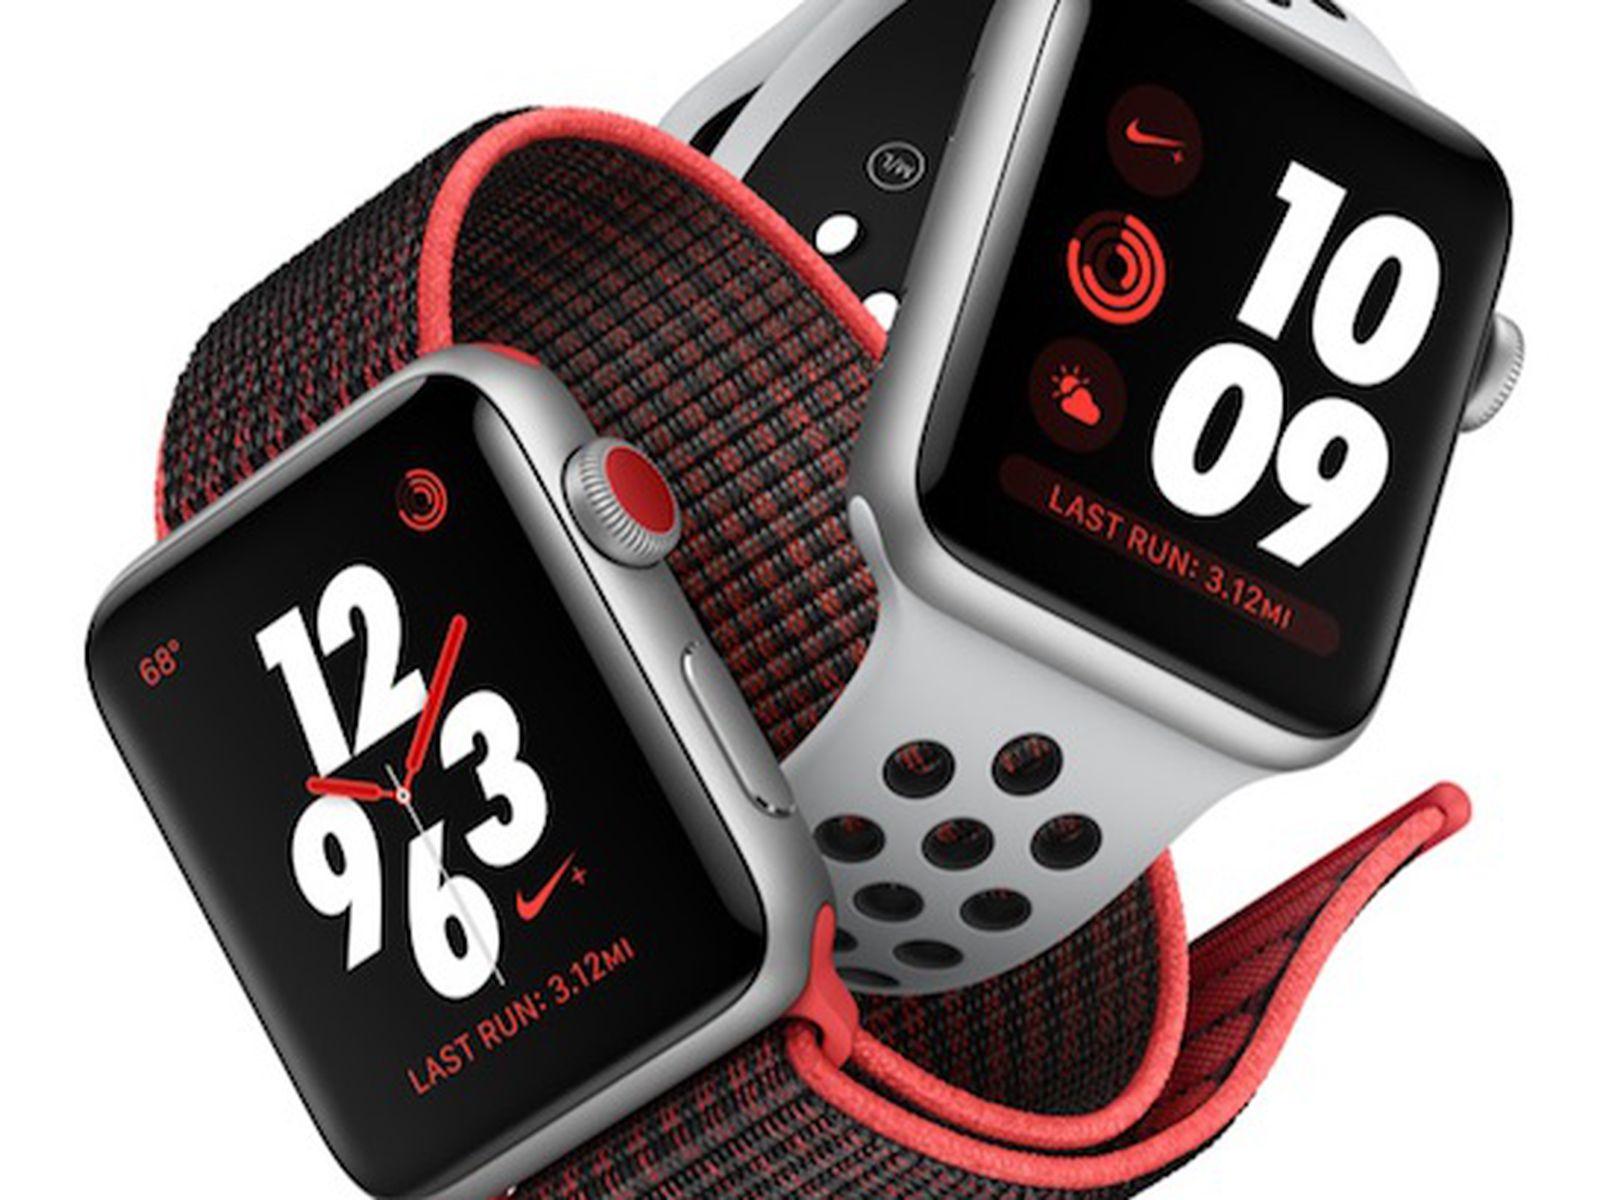 gesto Brillante Sabor  Apple Watch Series 3's Nike+ Models Have Slightly Later October 5 Launch  Date - MacRumors